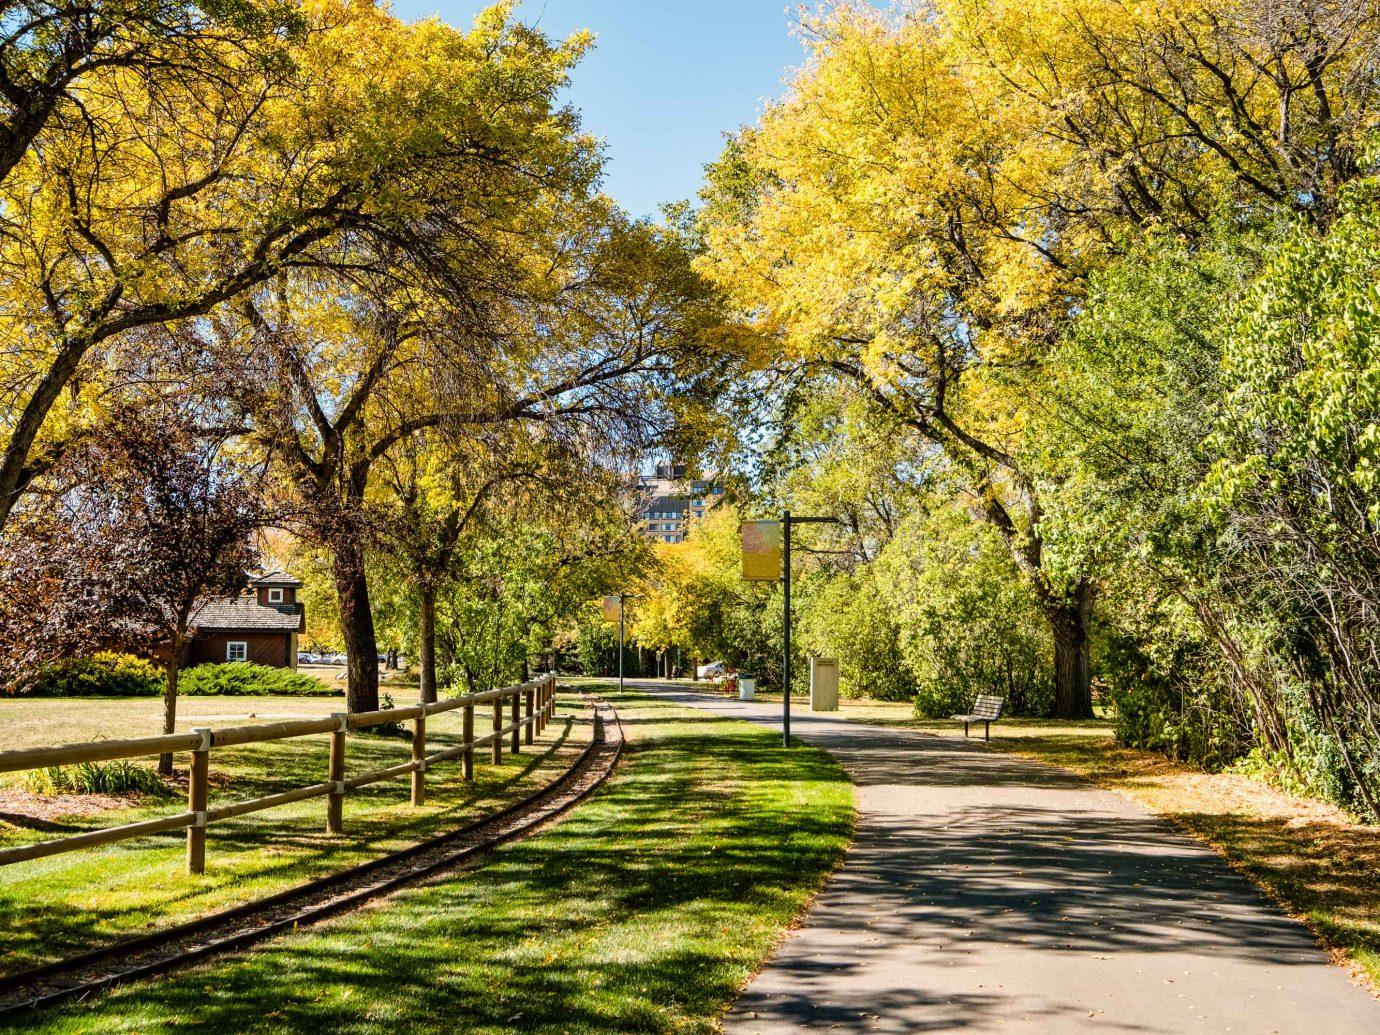 Walking path in Kinsmen Park in Saskatoon Trees curved path